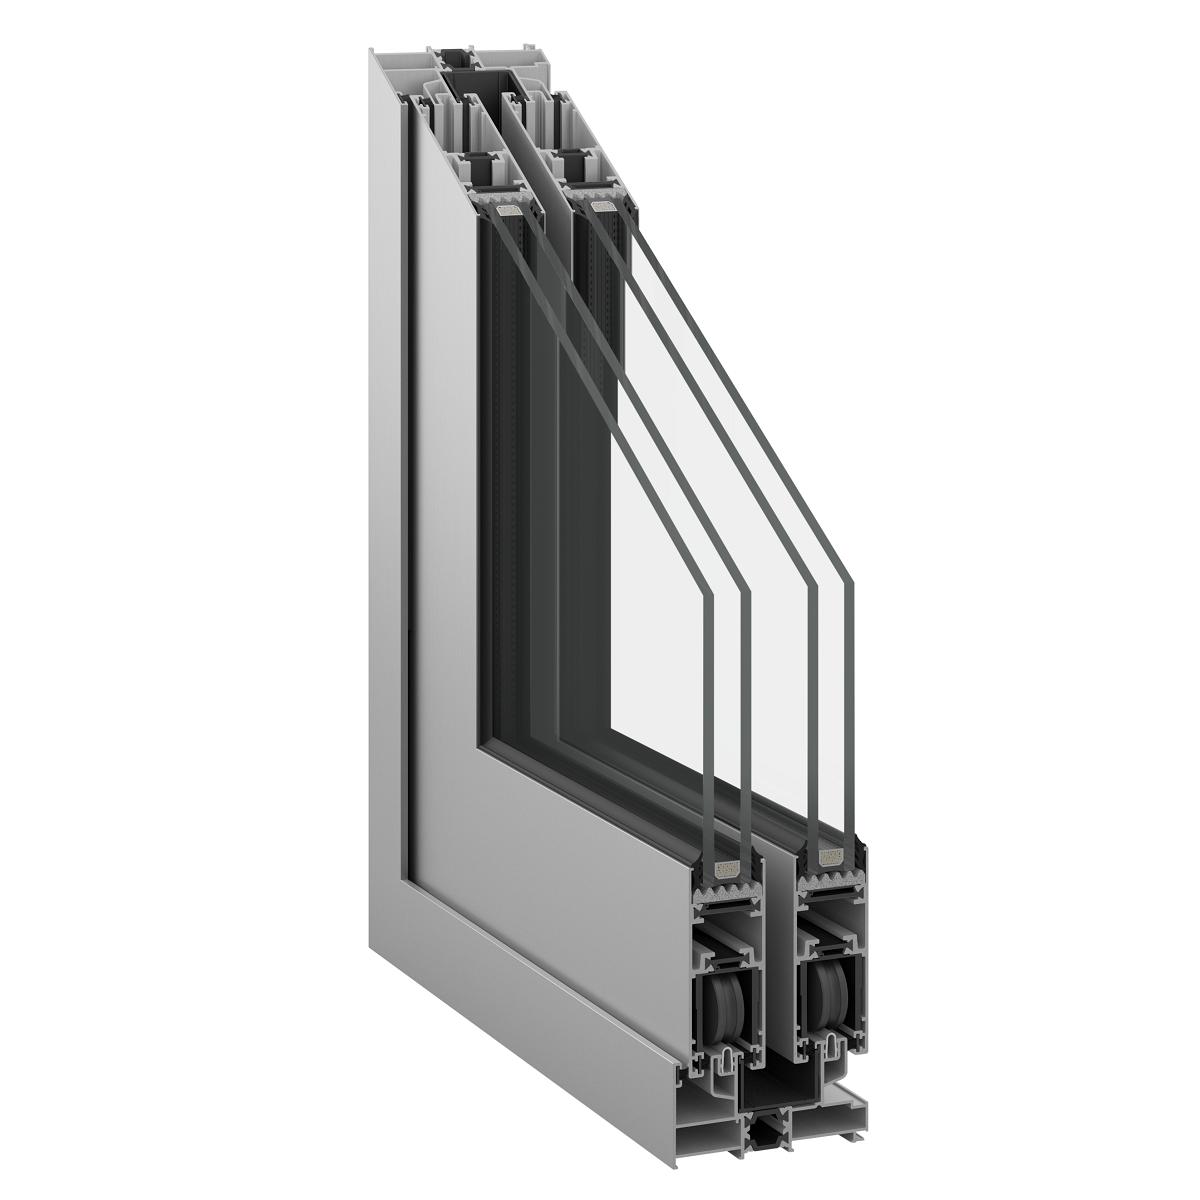 Inoform F25 thermally insulated sliding door